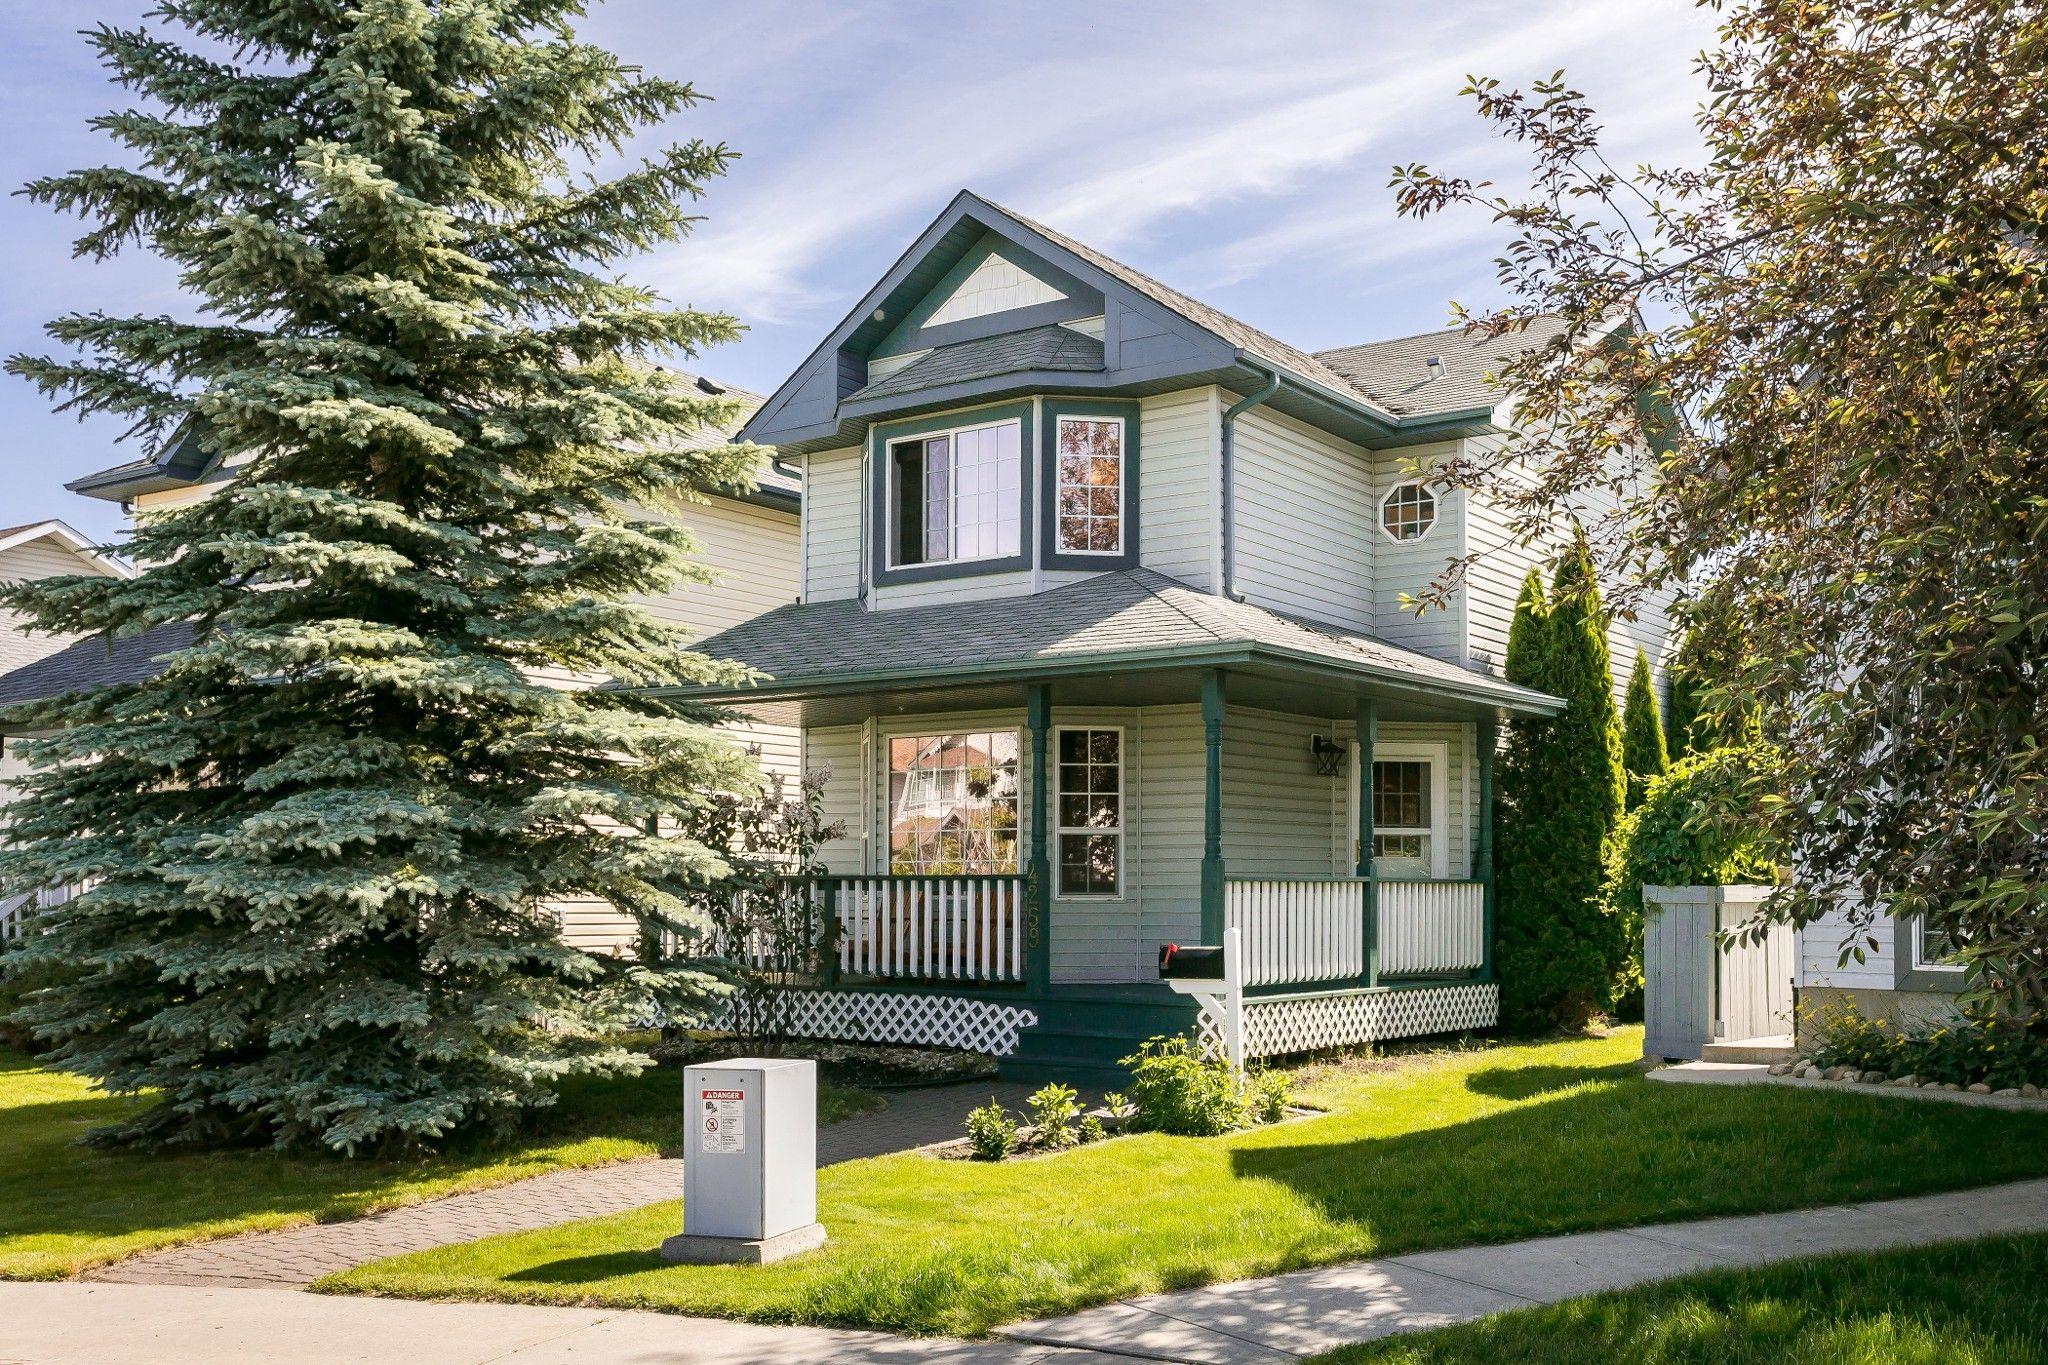 Main Photo: 4259 23St in Edmonton: Larkspur House for sale : MLS®# E4203591